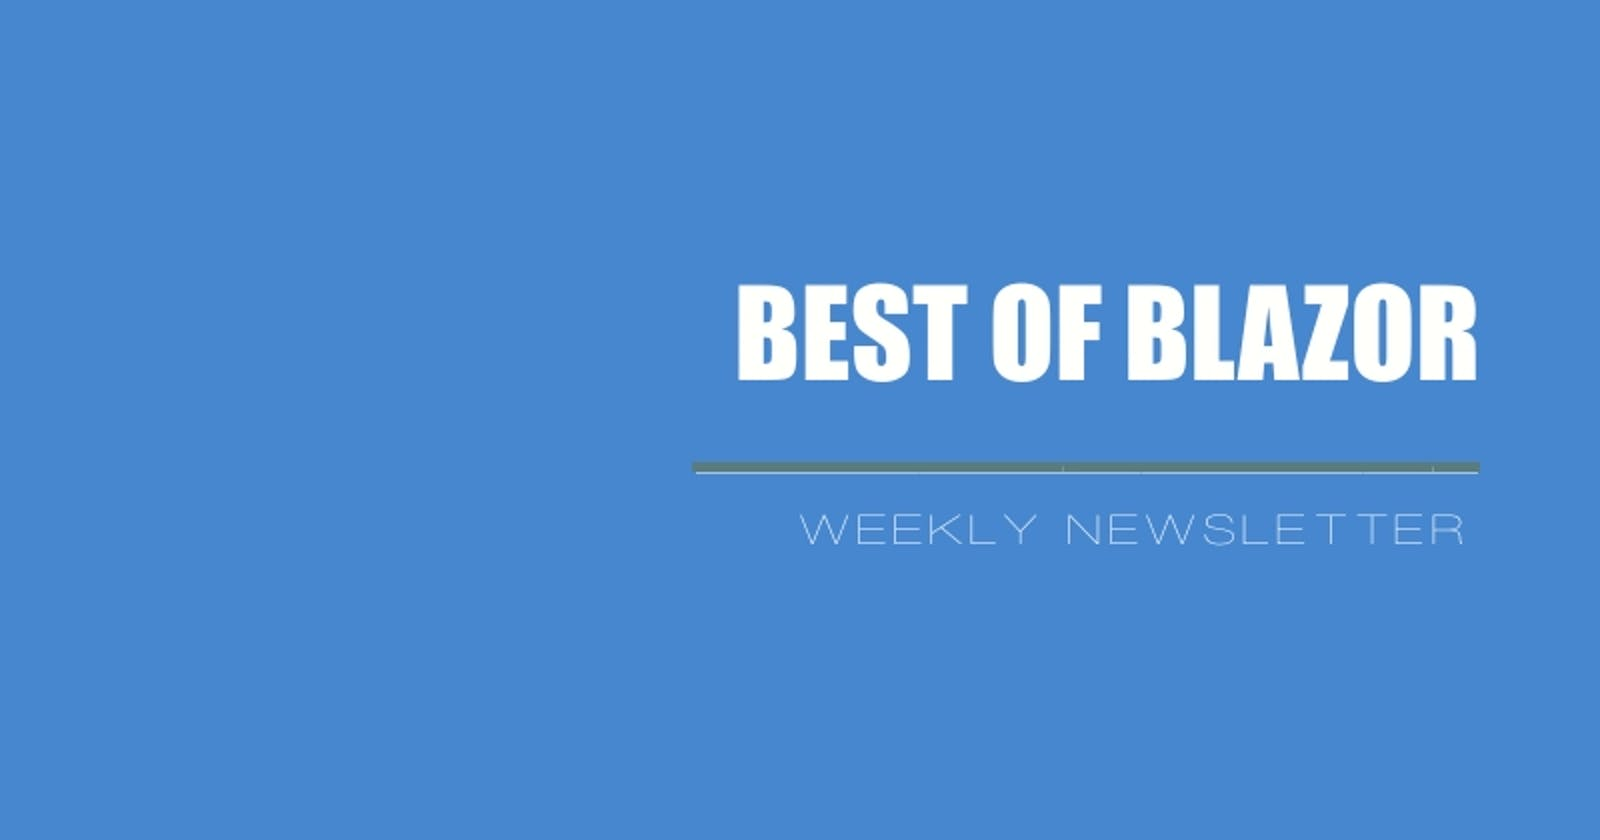 Blazor Weekly Newsletter #27